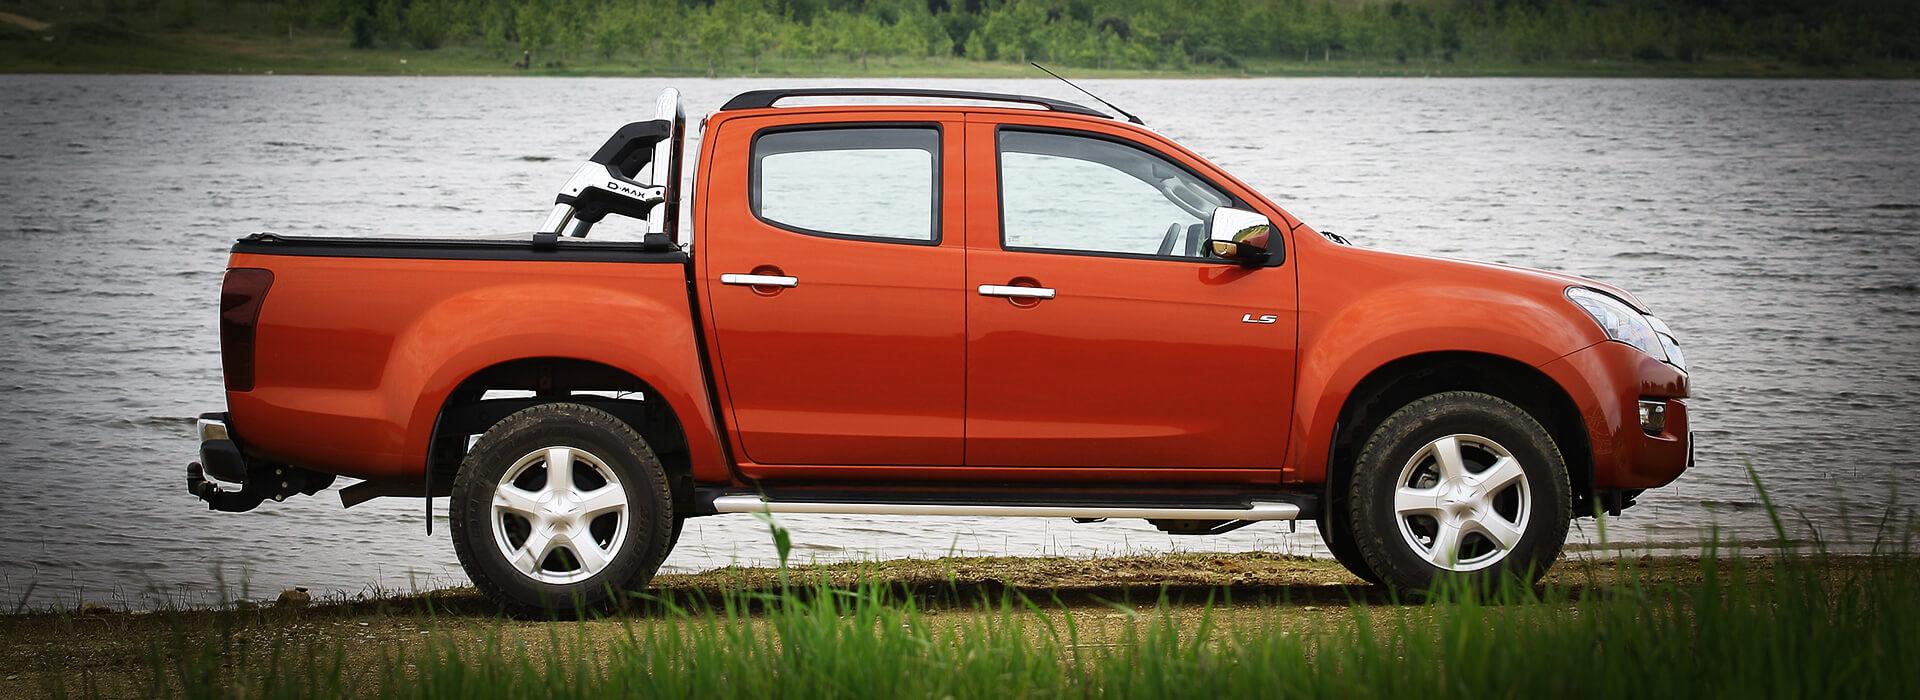 New Isuzu cars in Skipton, North Yorkshire - Midgley Motor Cars